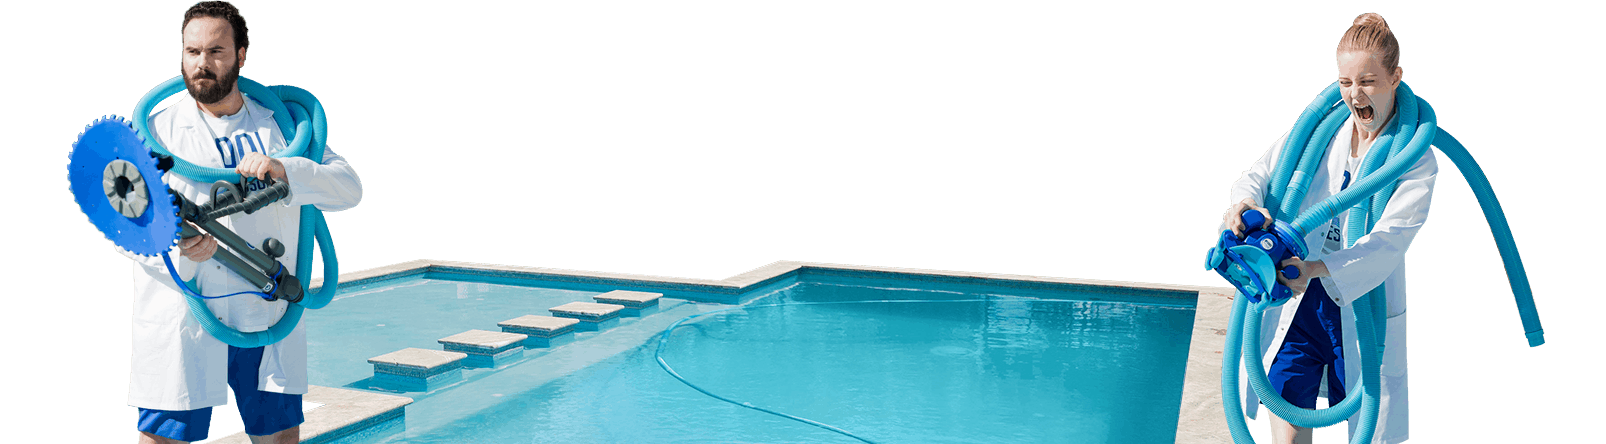 Pool Physics 101 Blog